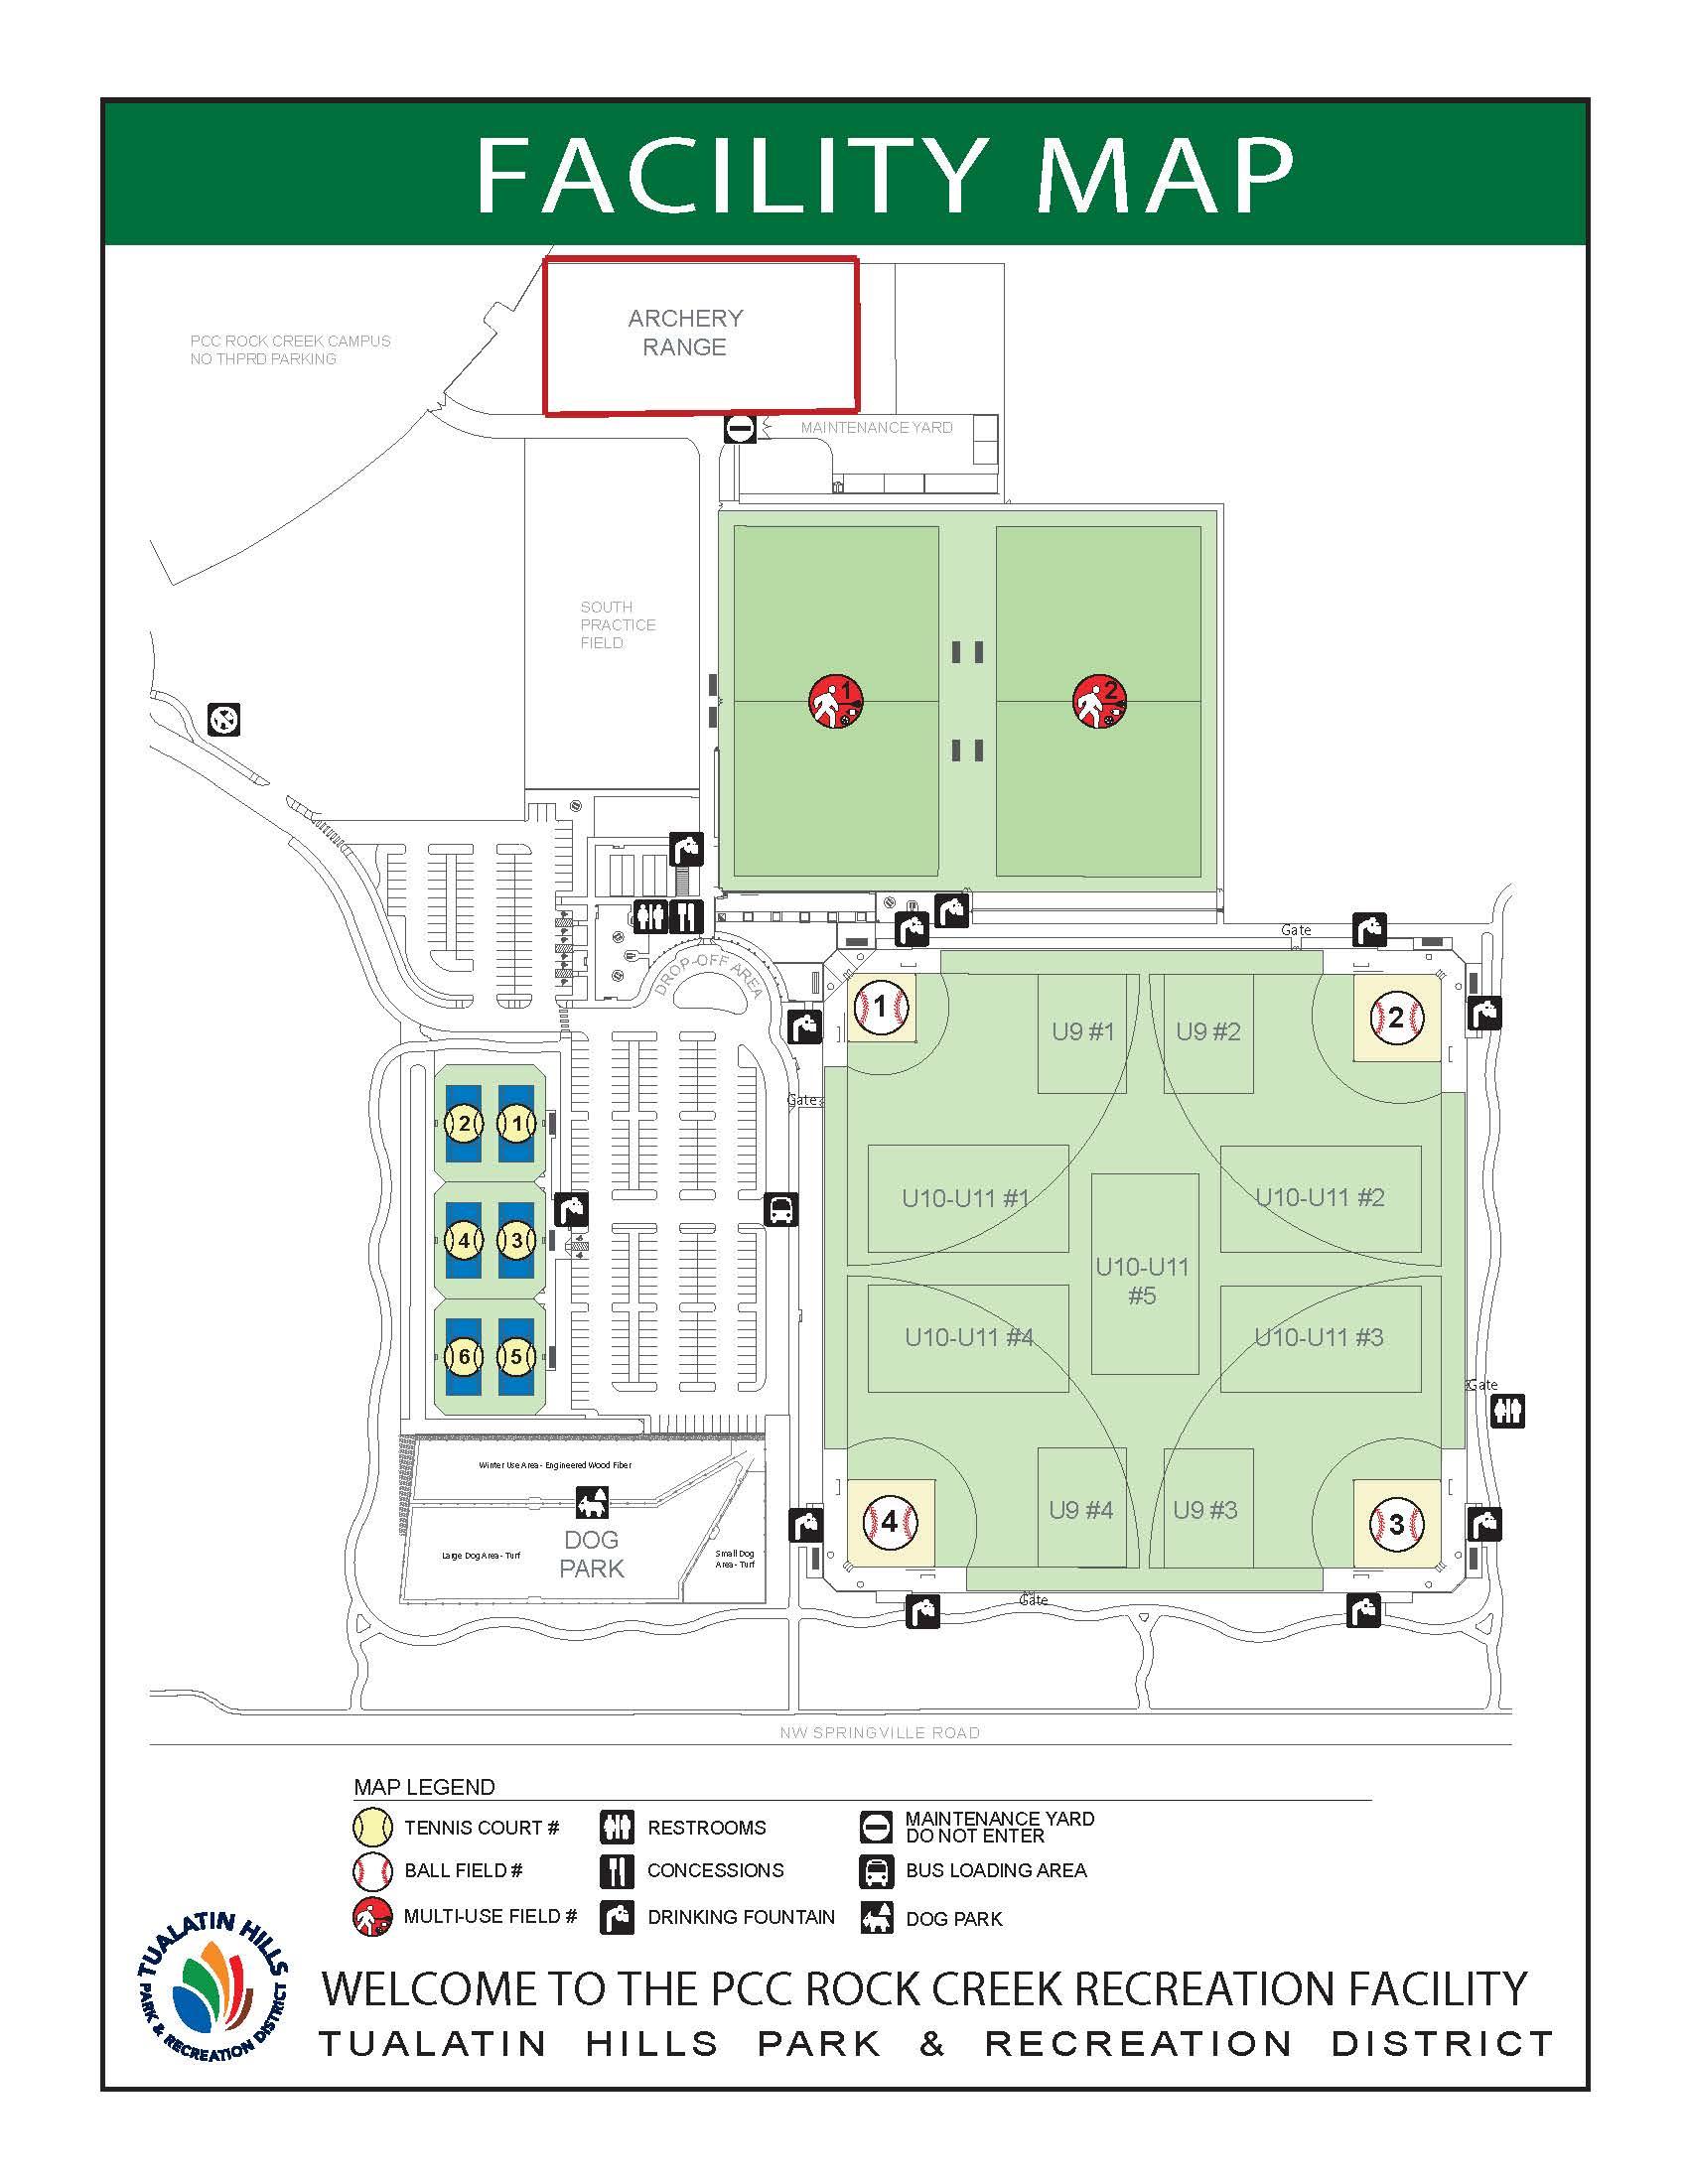 Pcc Rock Creek Campus Map   Paintingsforsale